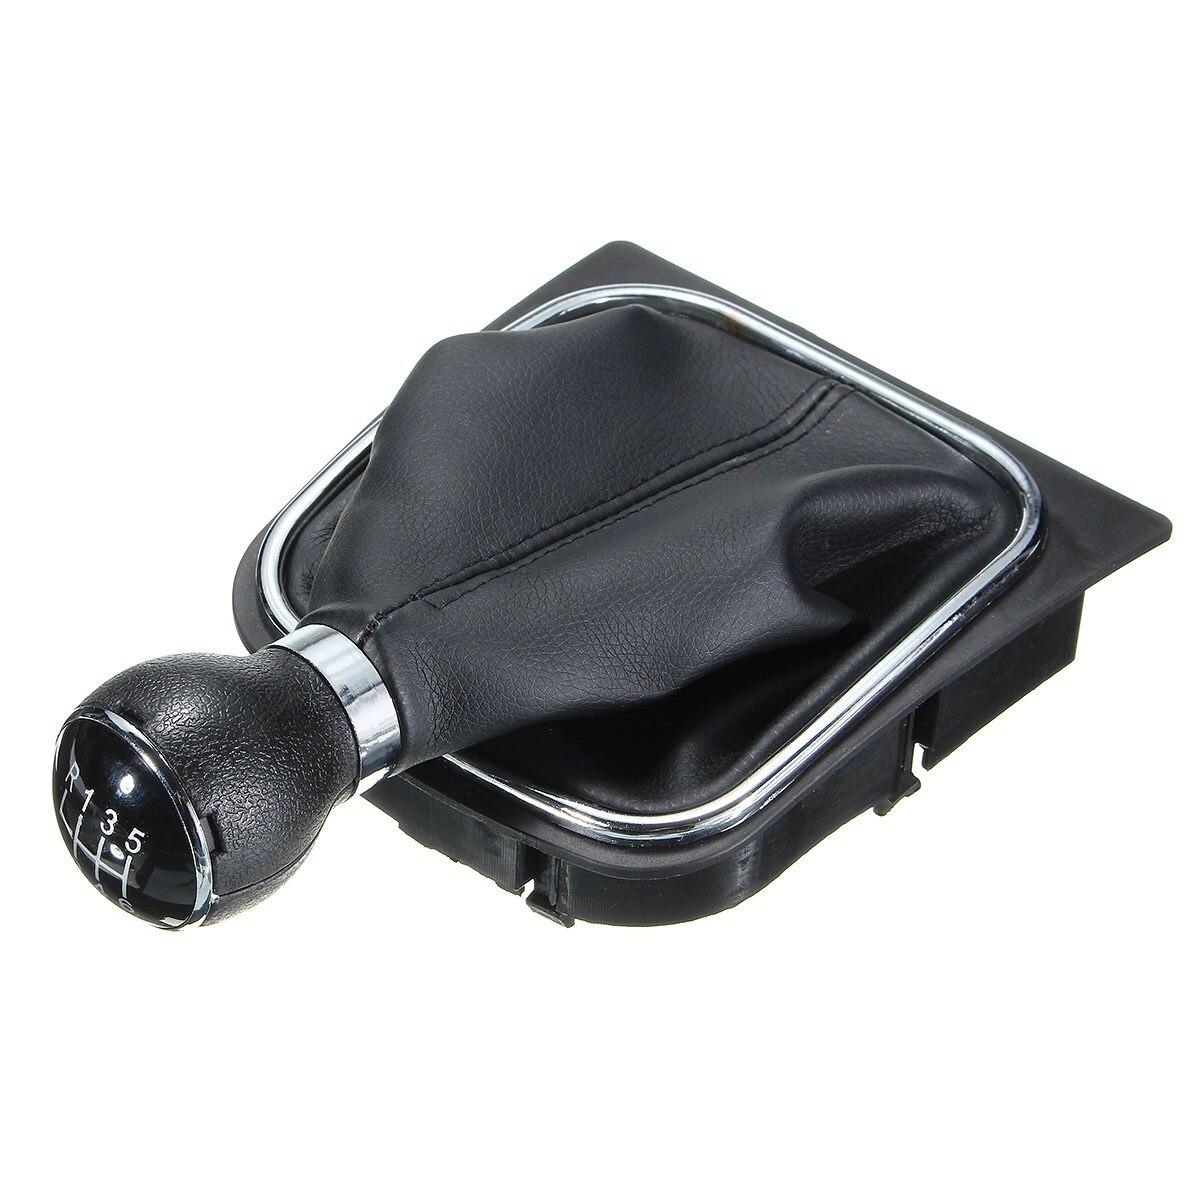 6 Speed Front Gear Shift Knob Gaiter Gaitor Boot For VW Golf Jetta Rabbit MK5 MK6 Plastic Leather Black shift knob leather red line manual transmission mt gear shift knob cover for vw golf 6 mk6 jetta 5 mk5 1kd 711 113 a